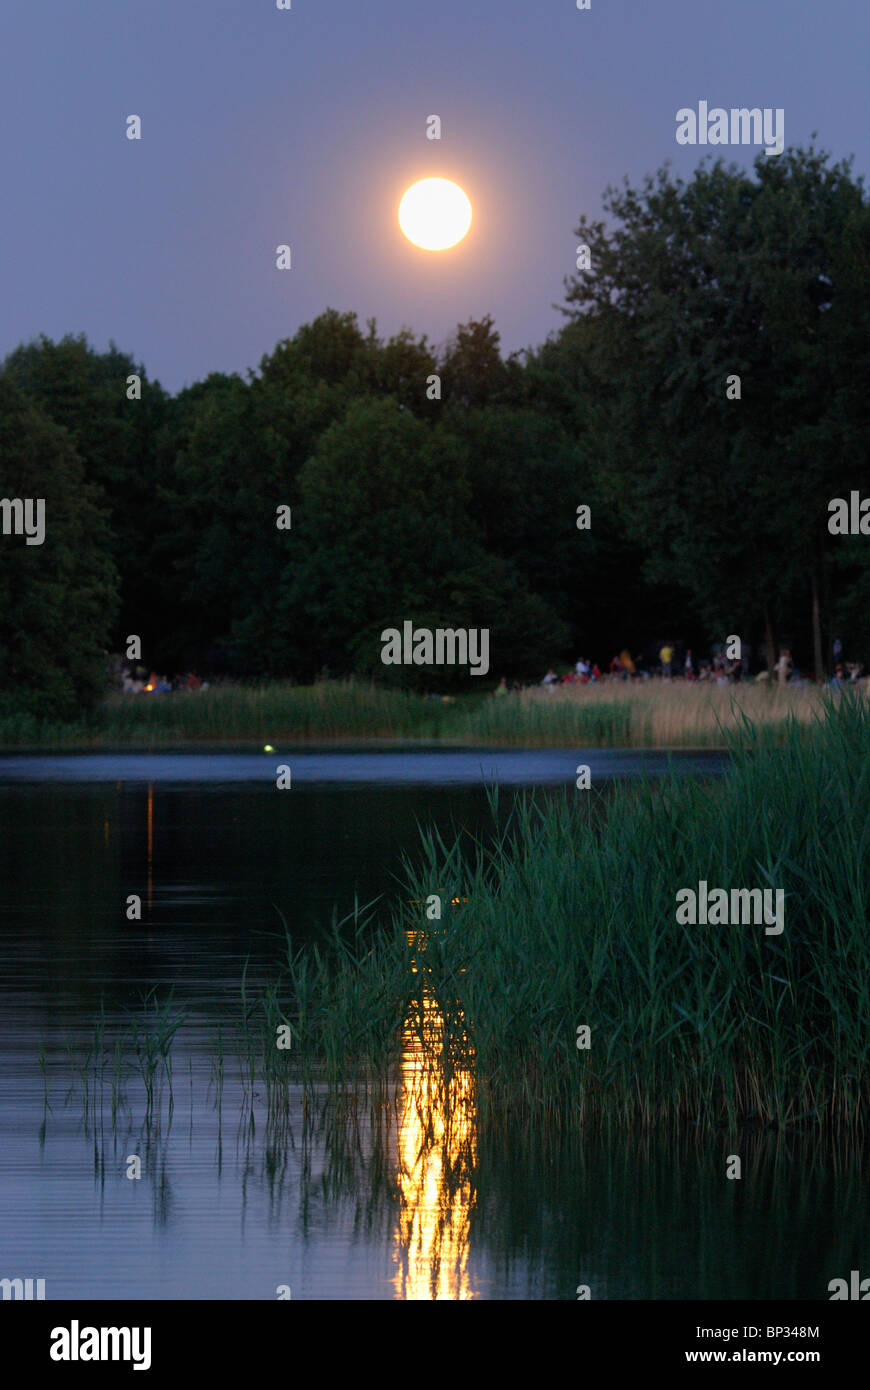 Midsummer night. Full moon over the lake, BUGA Park, Britzer Garten, Bundesgartenschau Park, Britz, Neukoelln, Berlin, - Stock Image